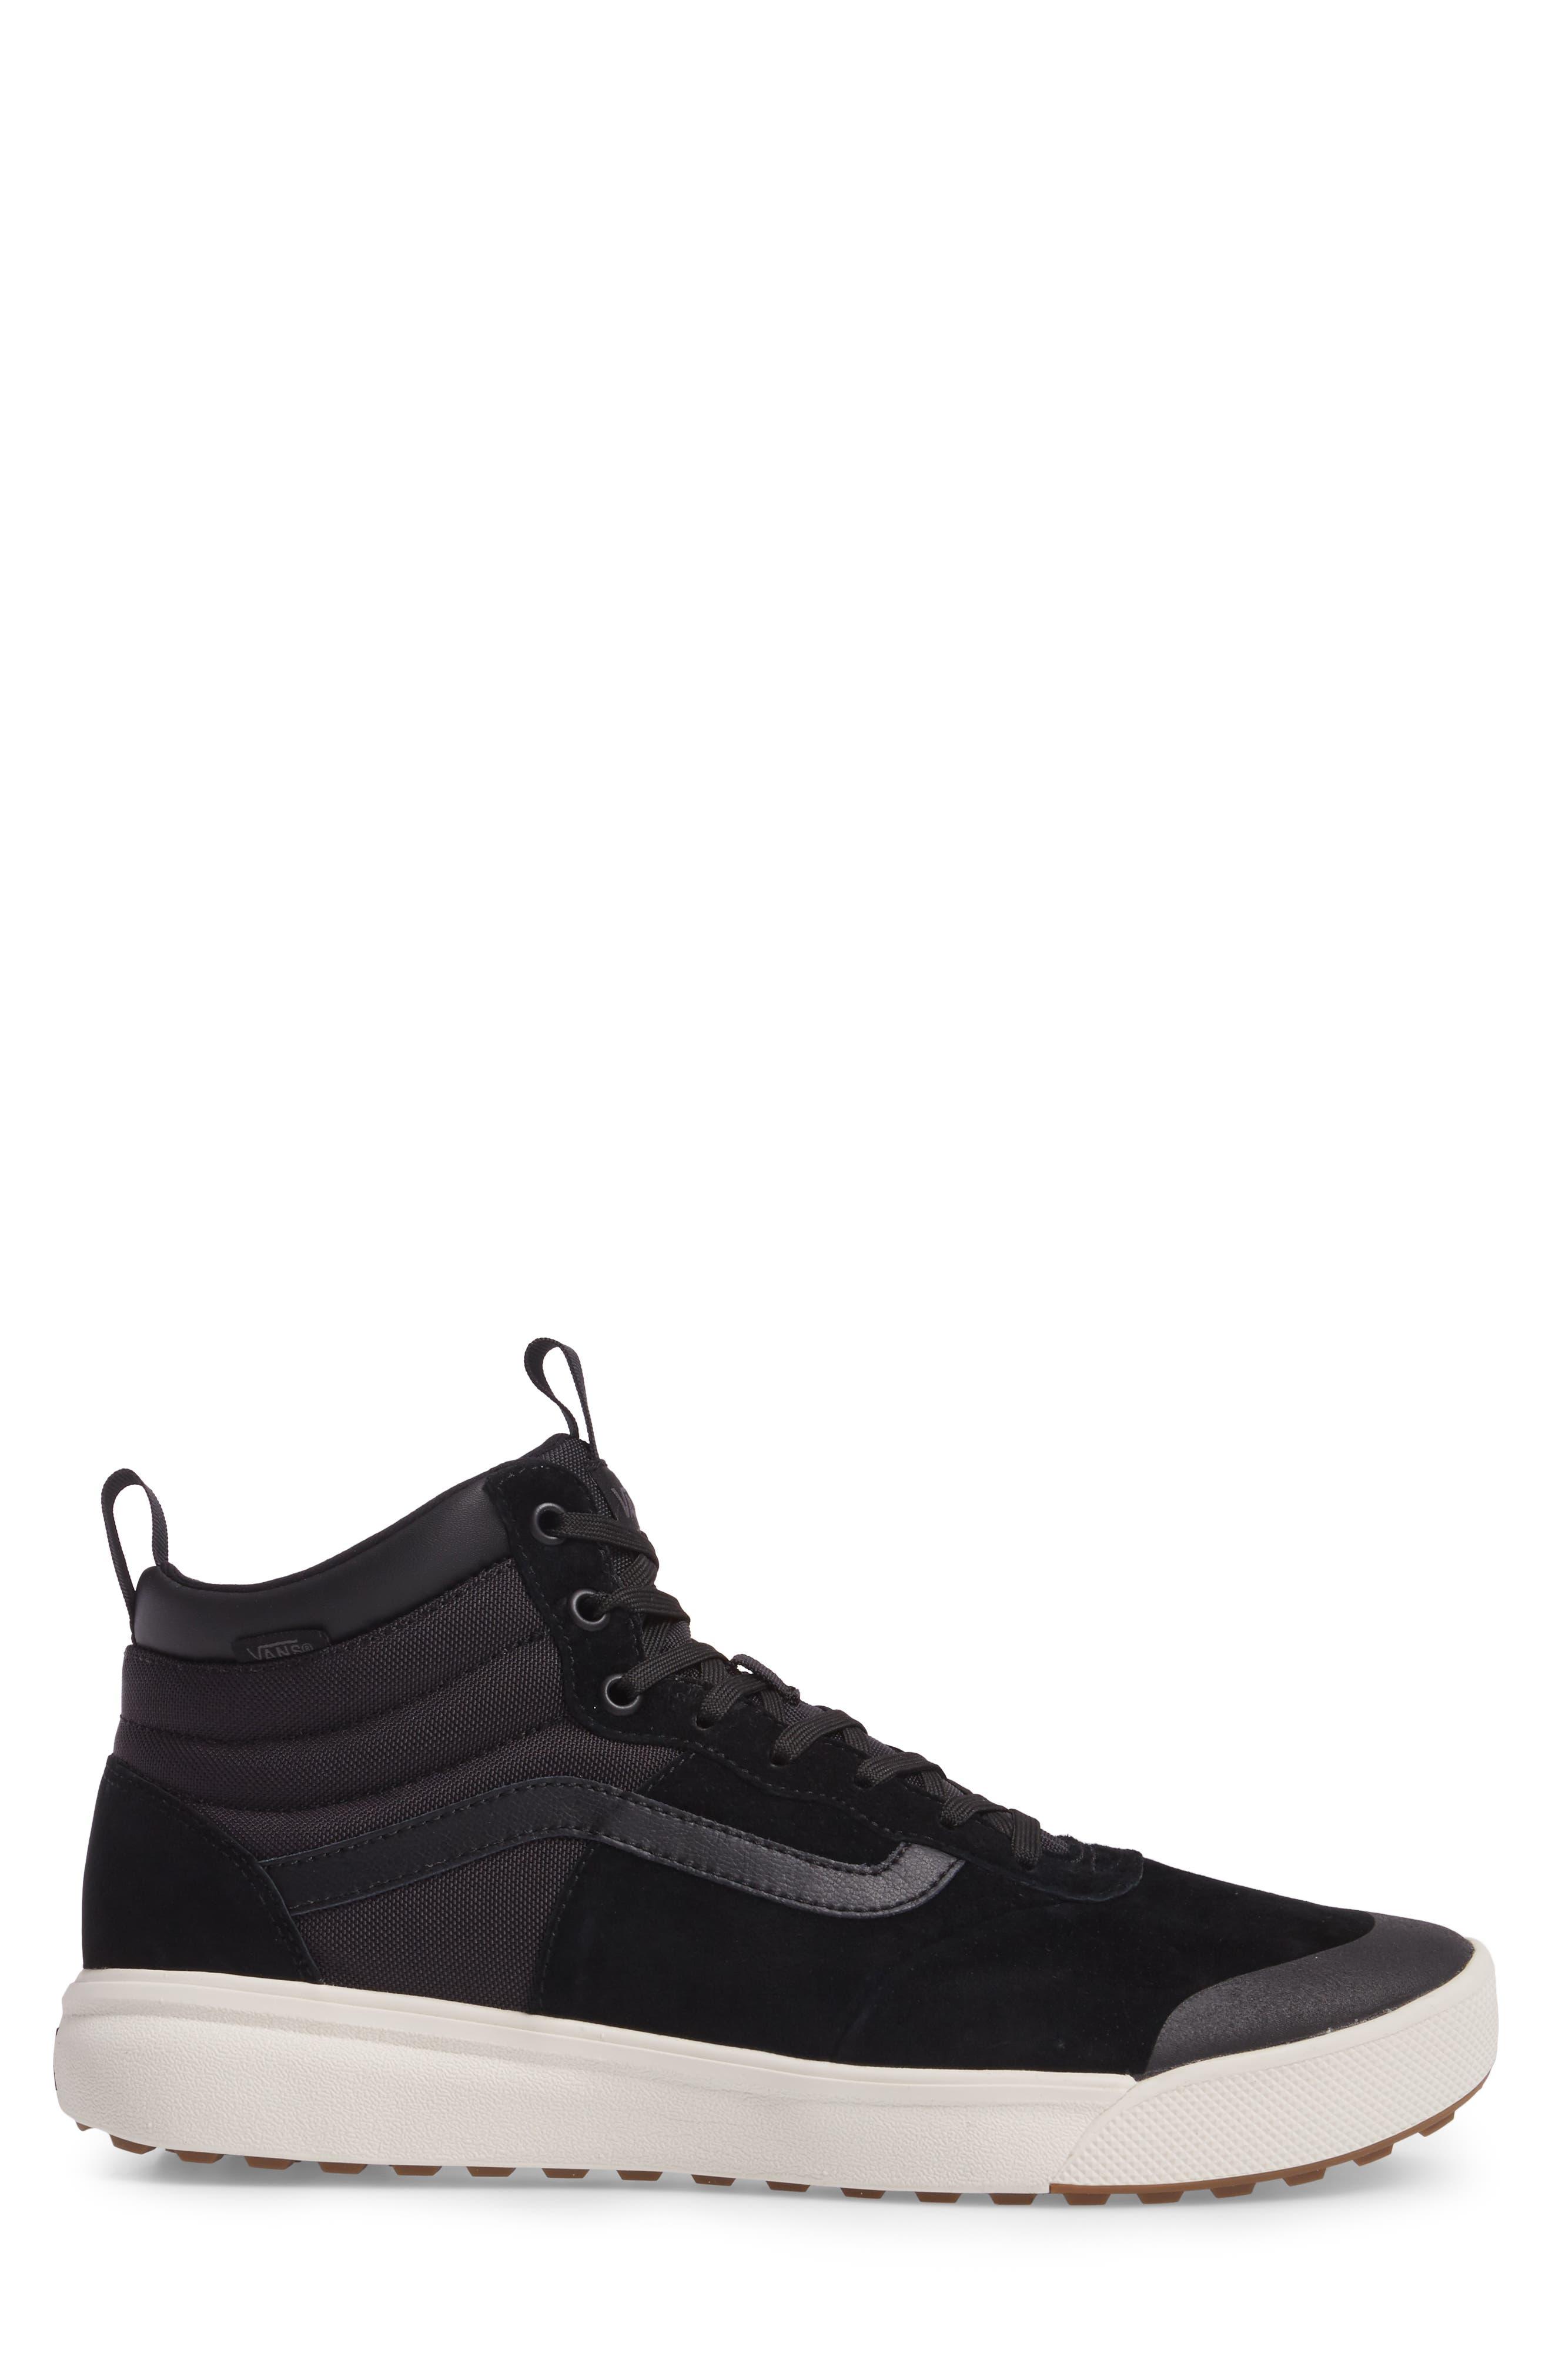 Ultrarange Hi Sneaker,                             Alternate thumbnail 3, color,                             BLACK SUEDE